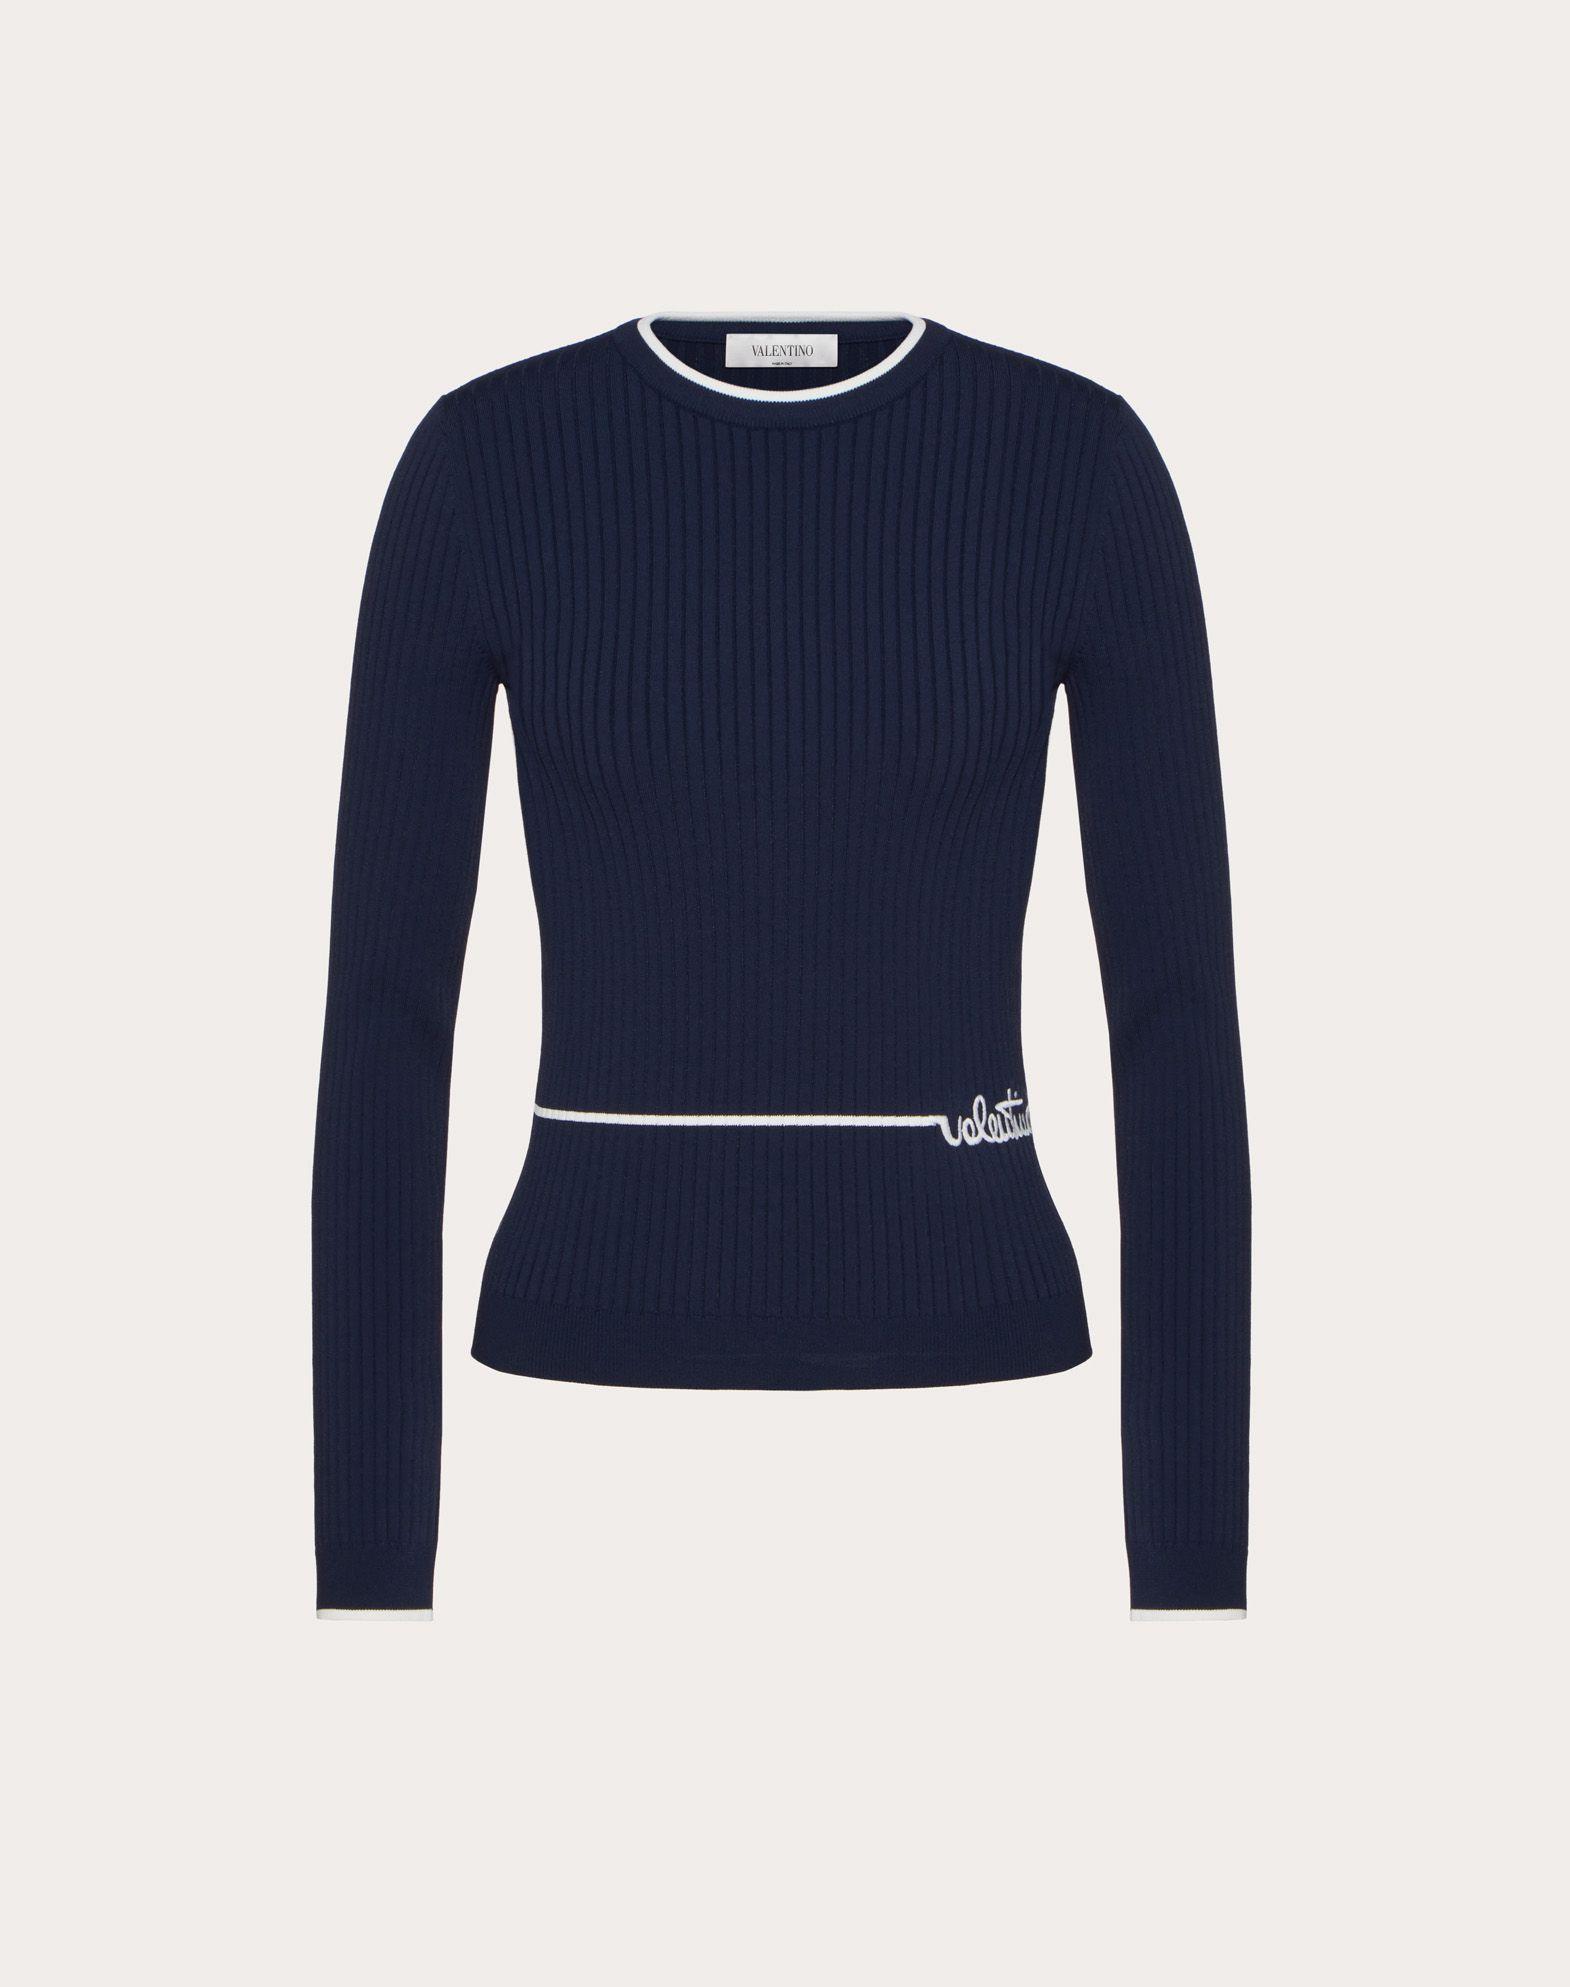 Viscose Sweater with Valentino Signature Embroidery